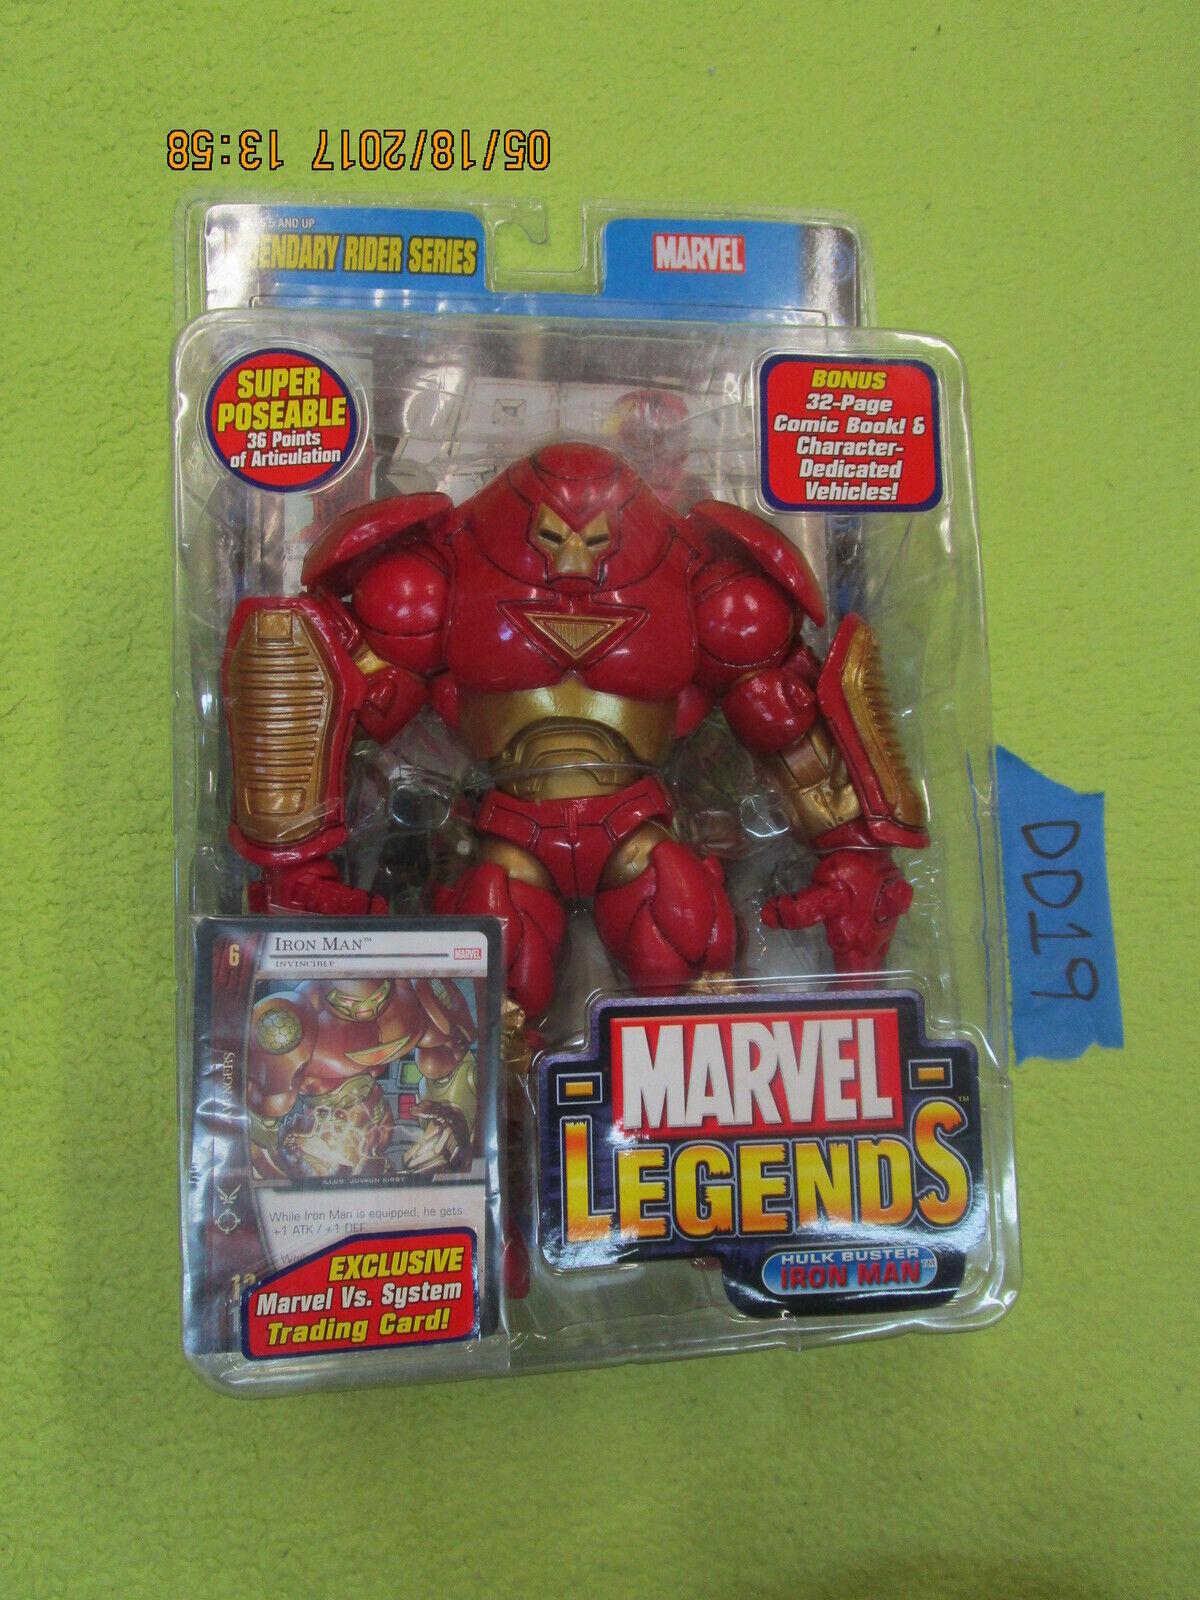 DD19 Toy Biz Marvel Legend Lot HULKBUSTER IRON MAN Legendary Rider Series VS TCG